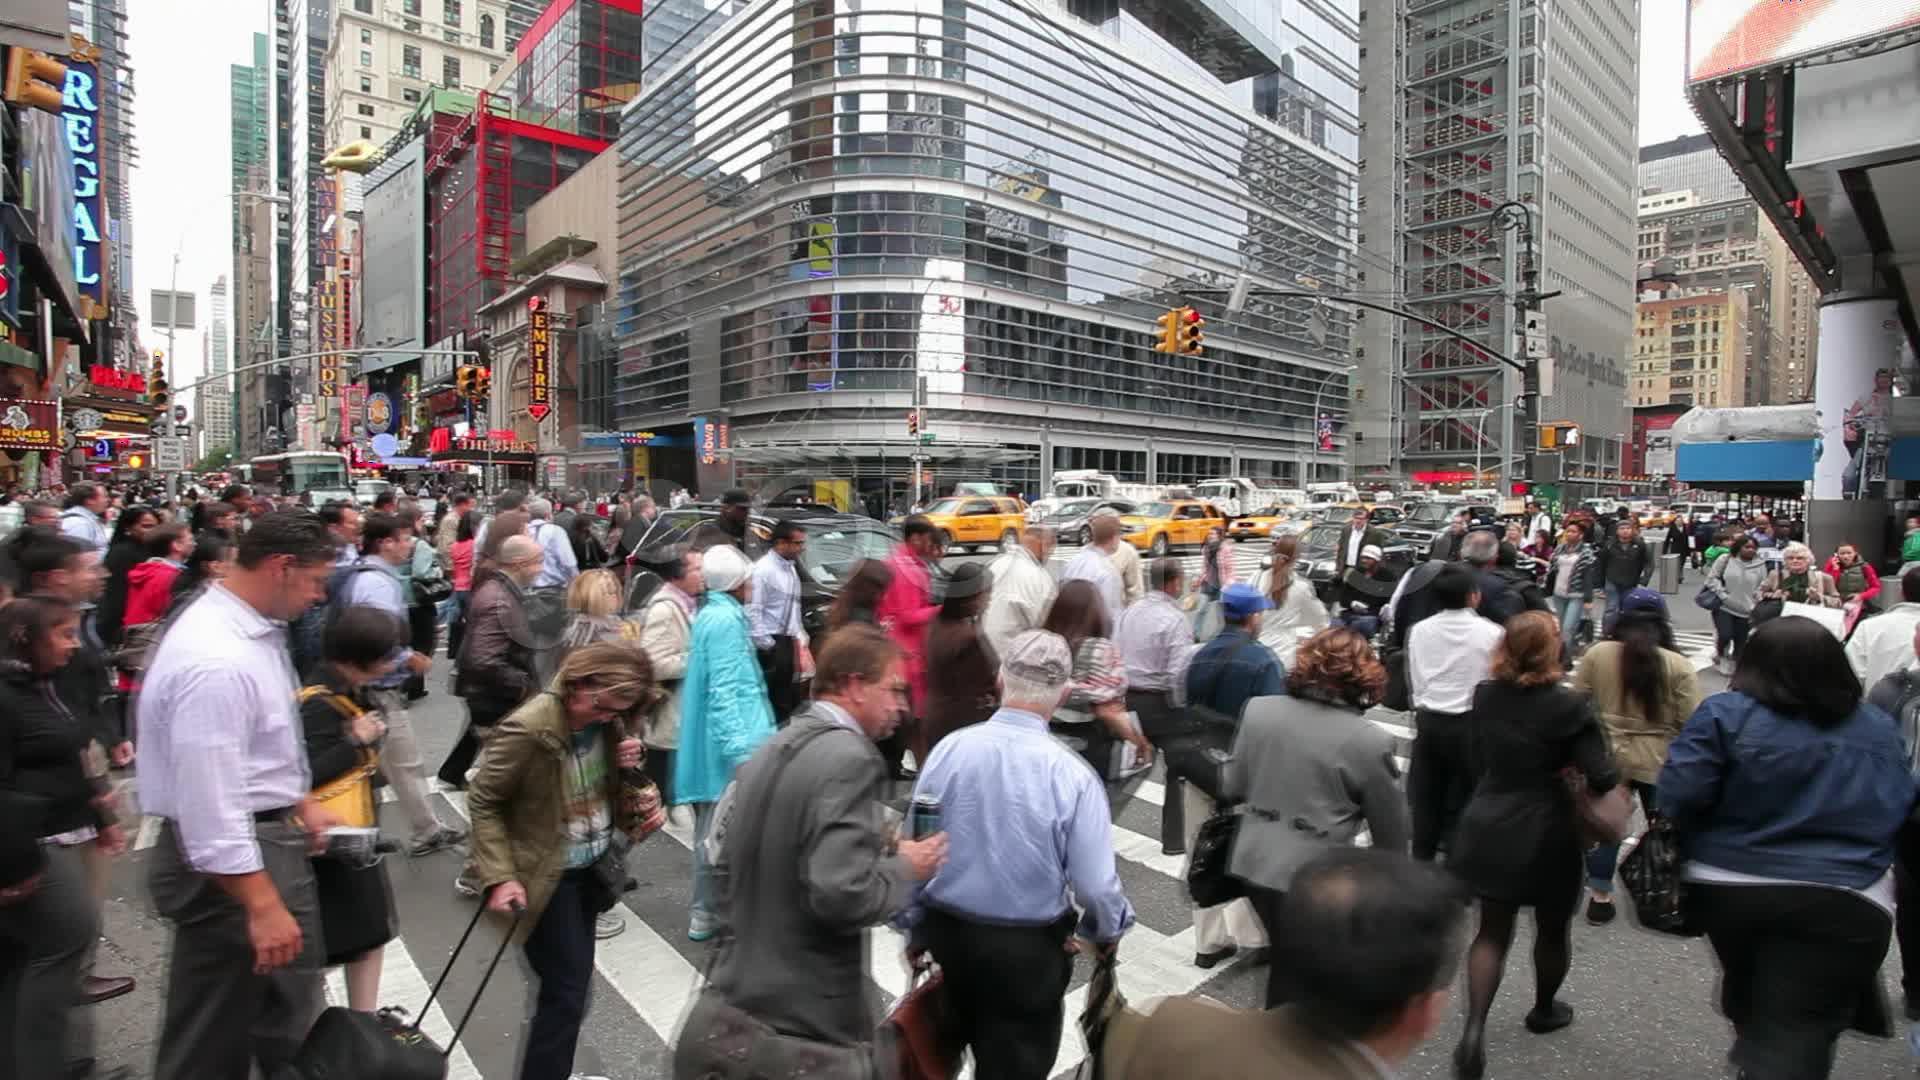 Crowd of People Walking Blurred